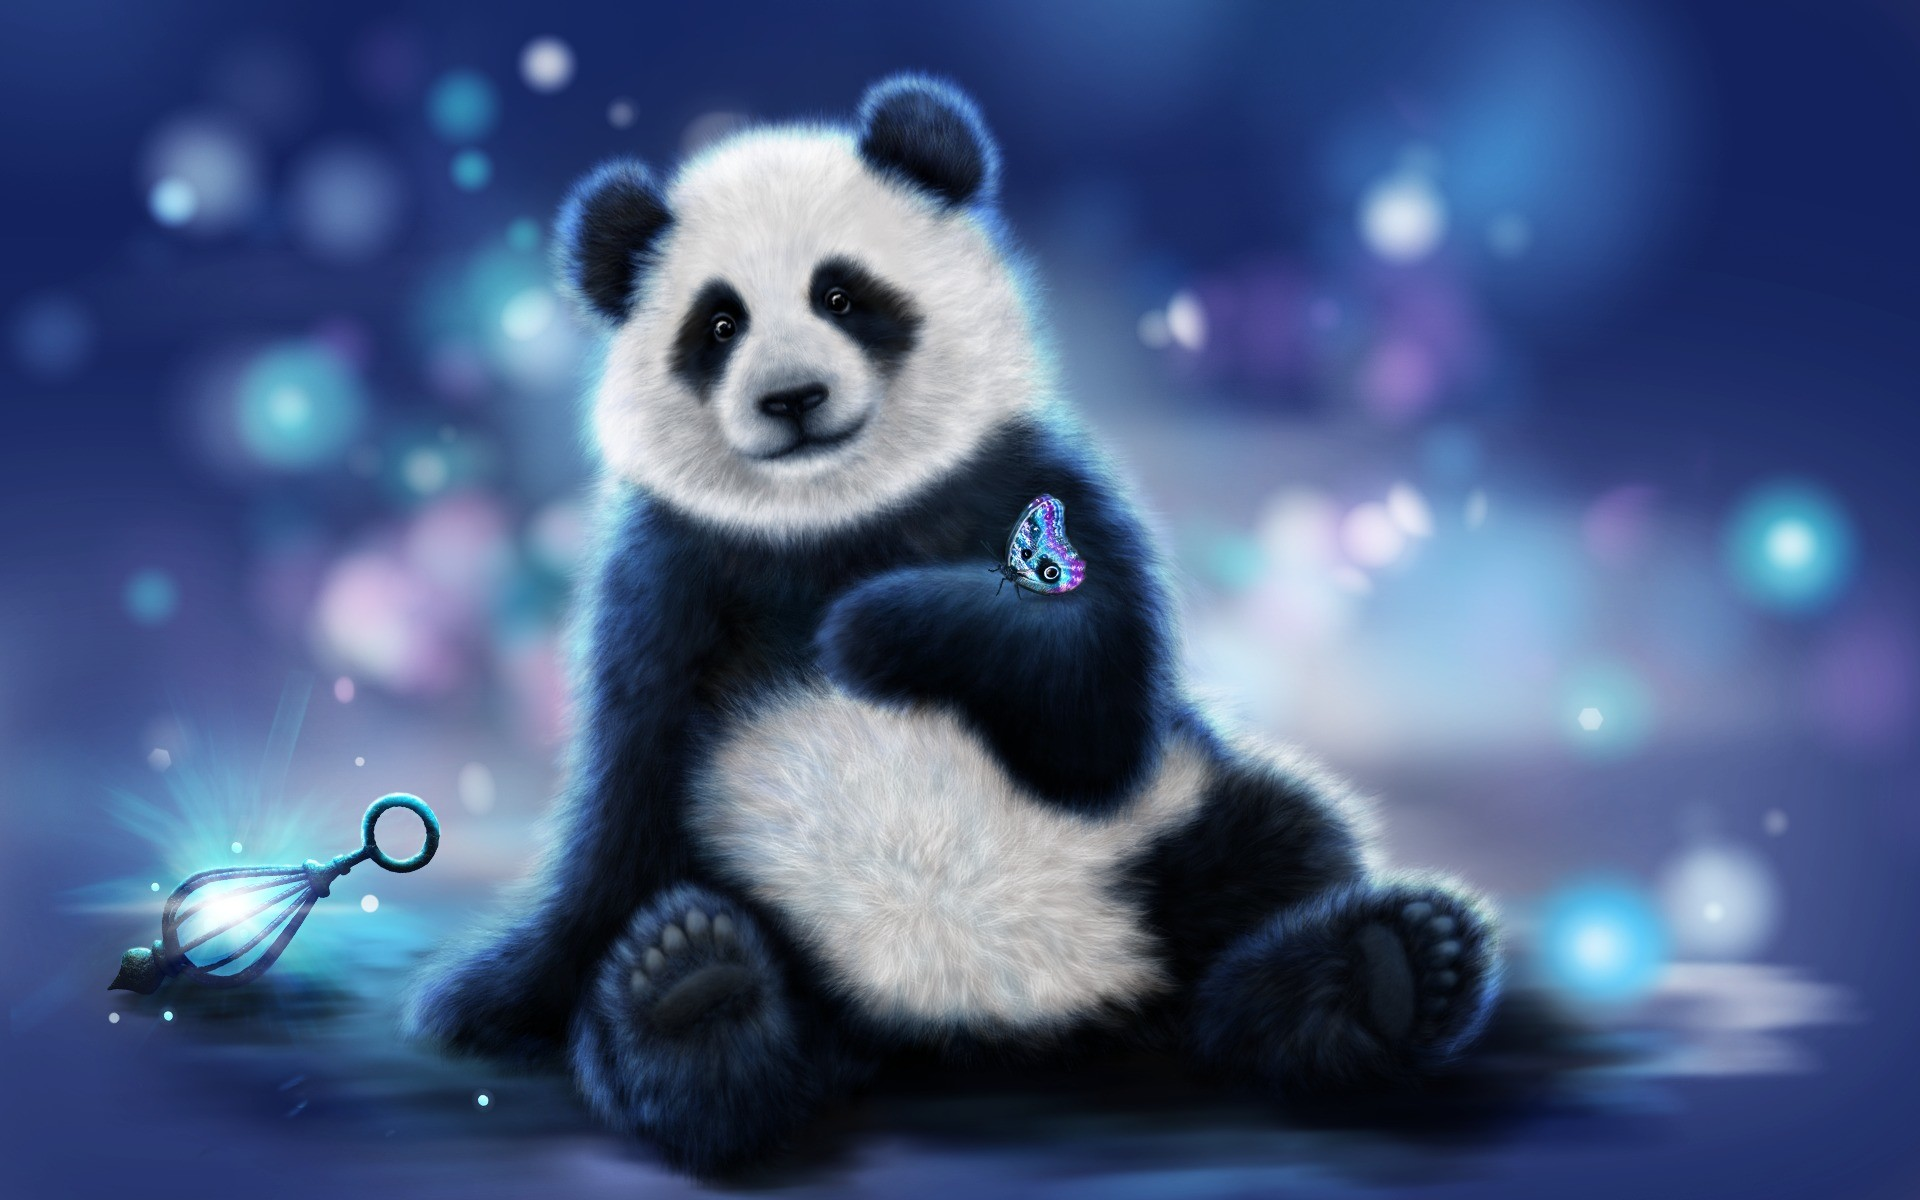 Cute Panda And Butterfly HD Wallpaper